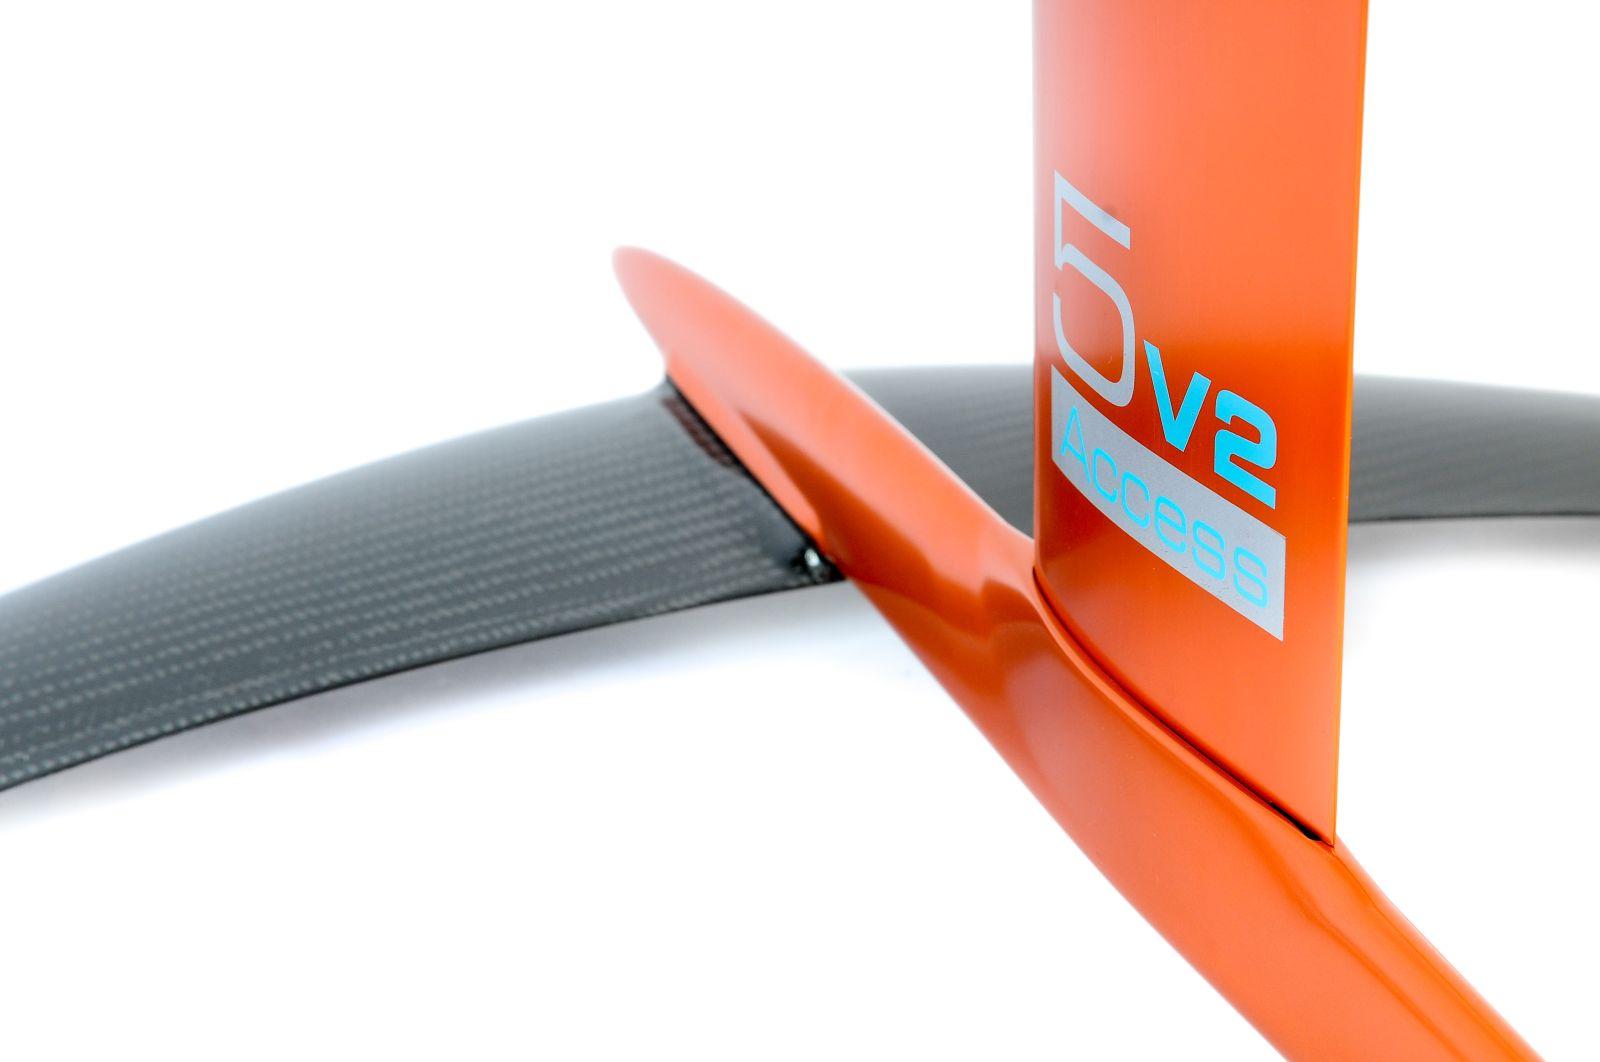 Kitefoil carbon aluminium alpinefoil 5 0 access v2 3527 1